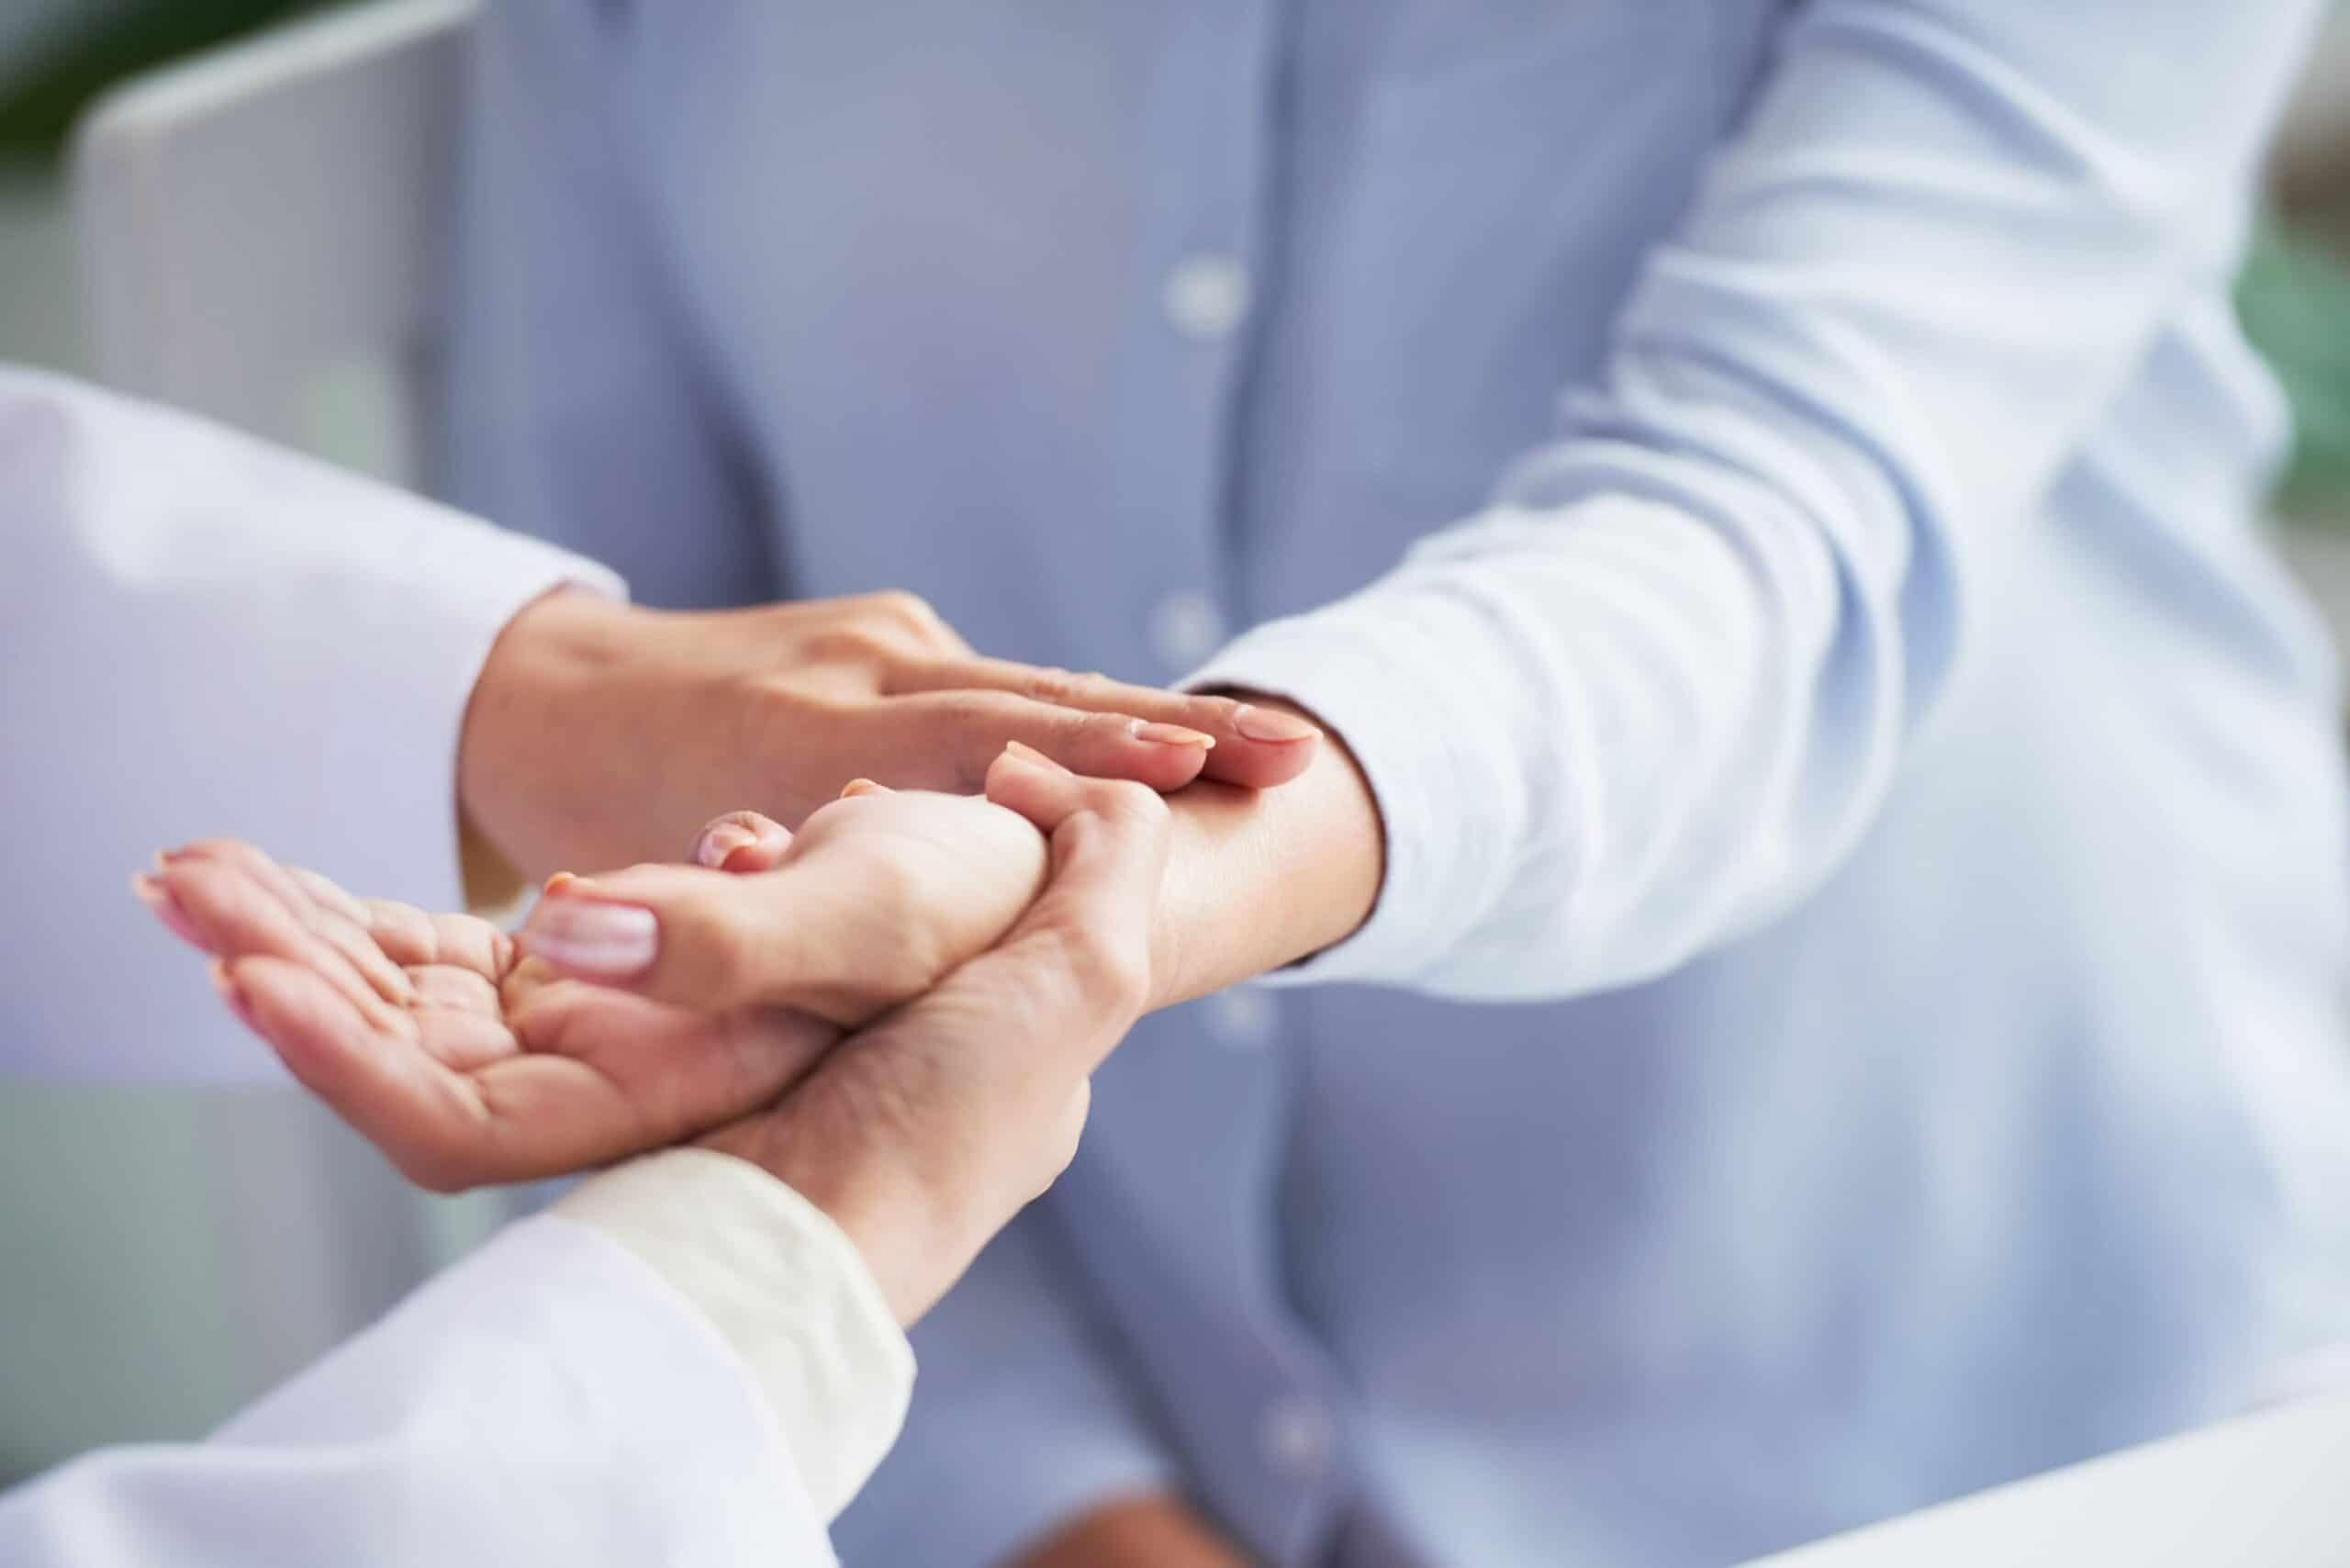 dottore esamina polso per emogasanalisi